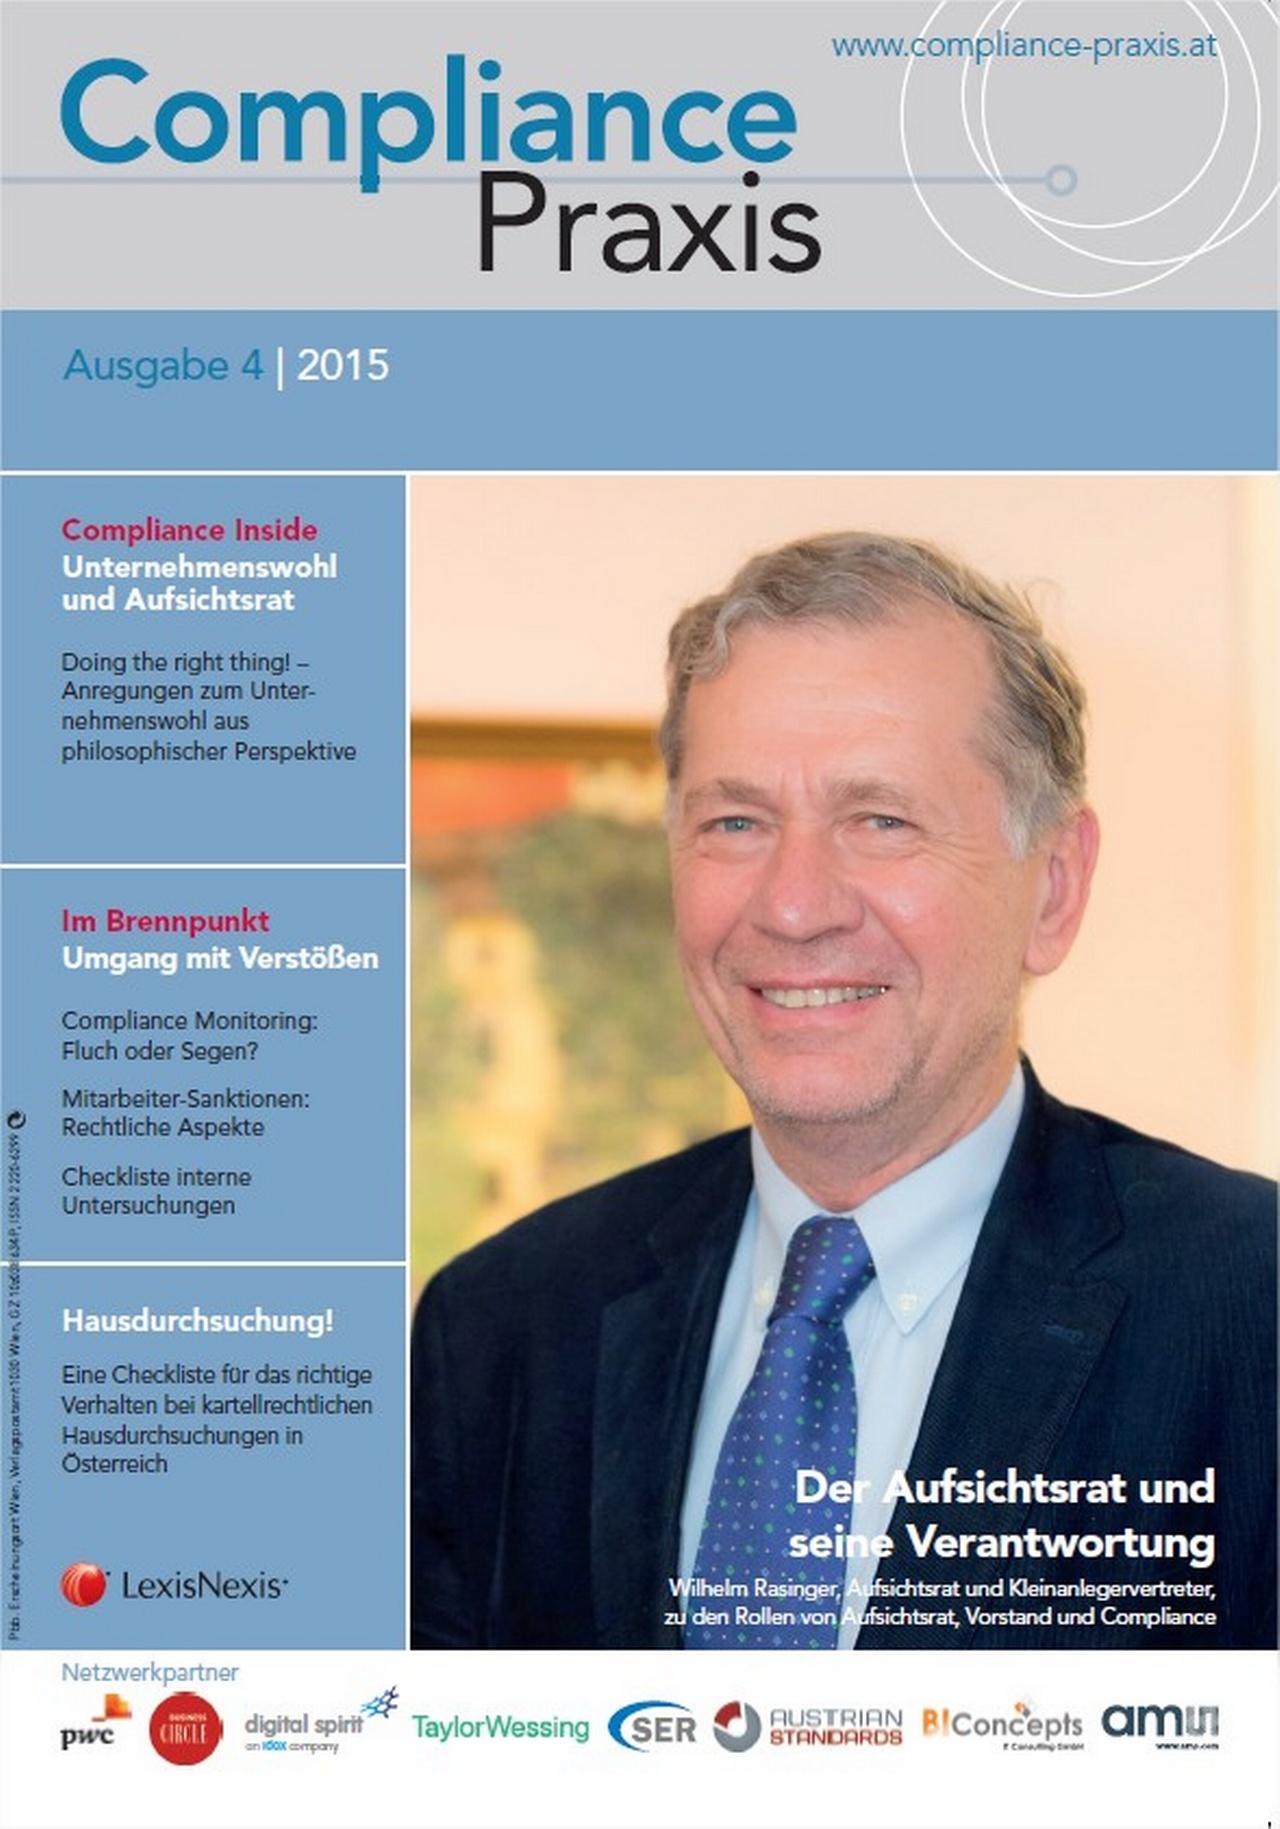 Cover von Compliance Praxis Ausgabe 4/2015, © LexisNexis